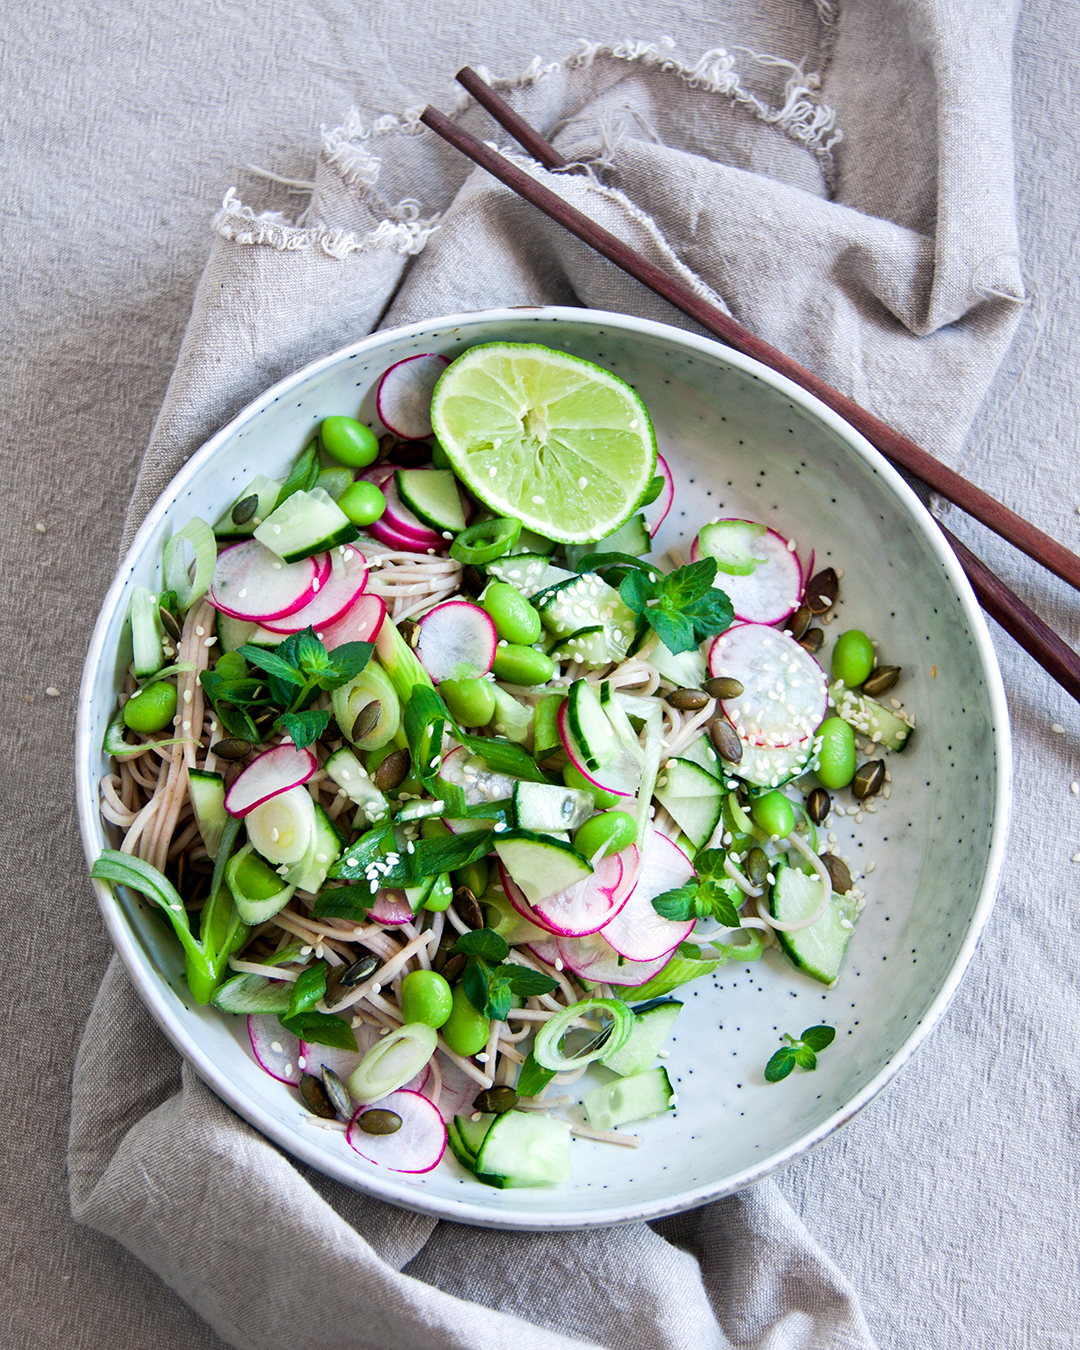 noedelsalade-radijs-edamamebonen-vegan-whole-foods-olievrij-glutenvrij.jpg